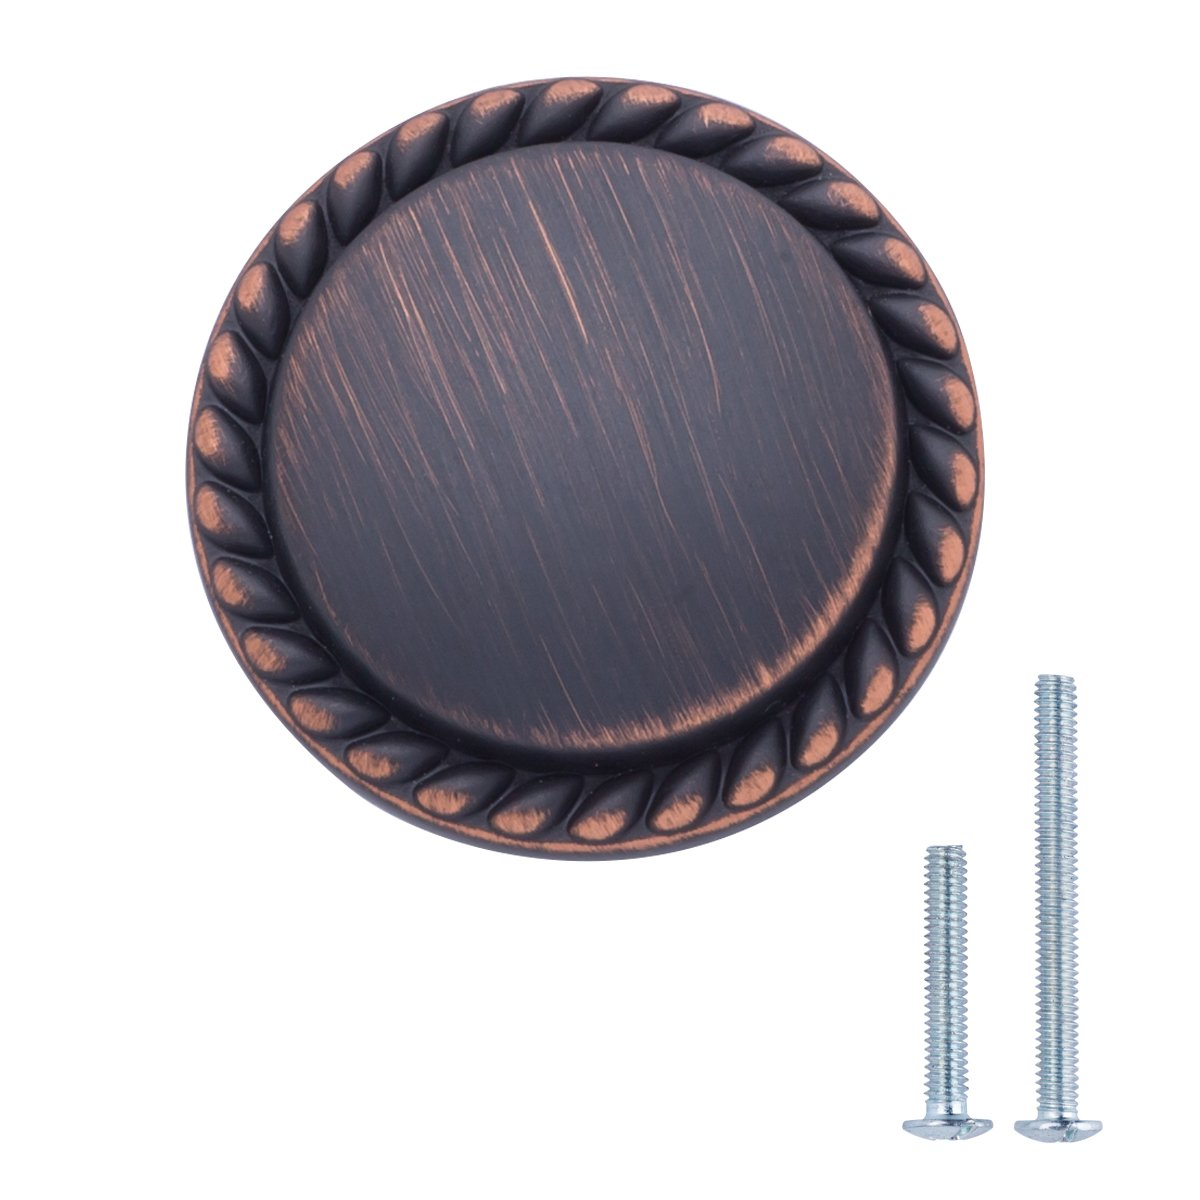 AmazonBasics Round Braided Cabinet Knob, 1.25'' Diameter, Oil Rubbed Bronze, 10-Pack